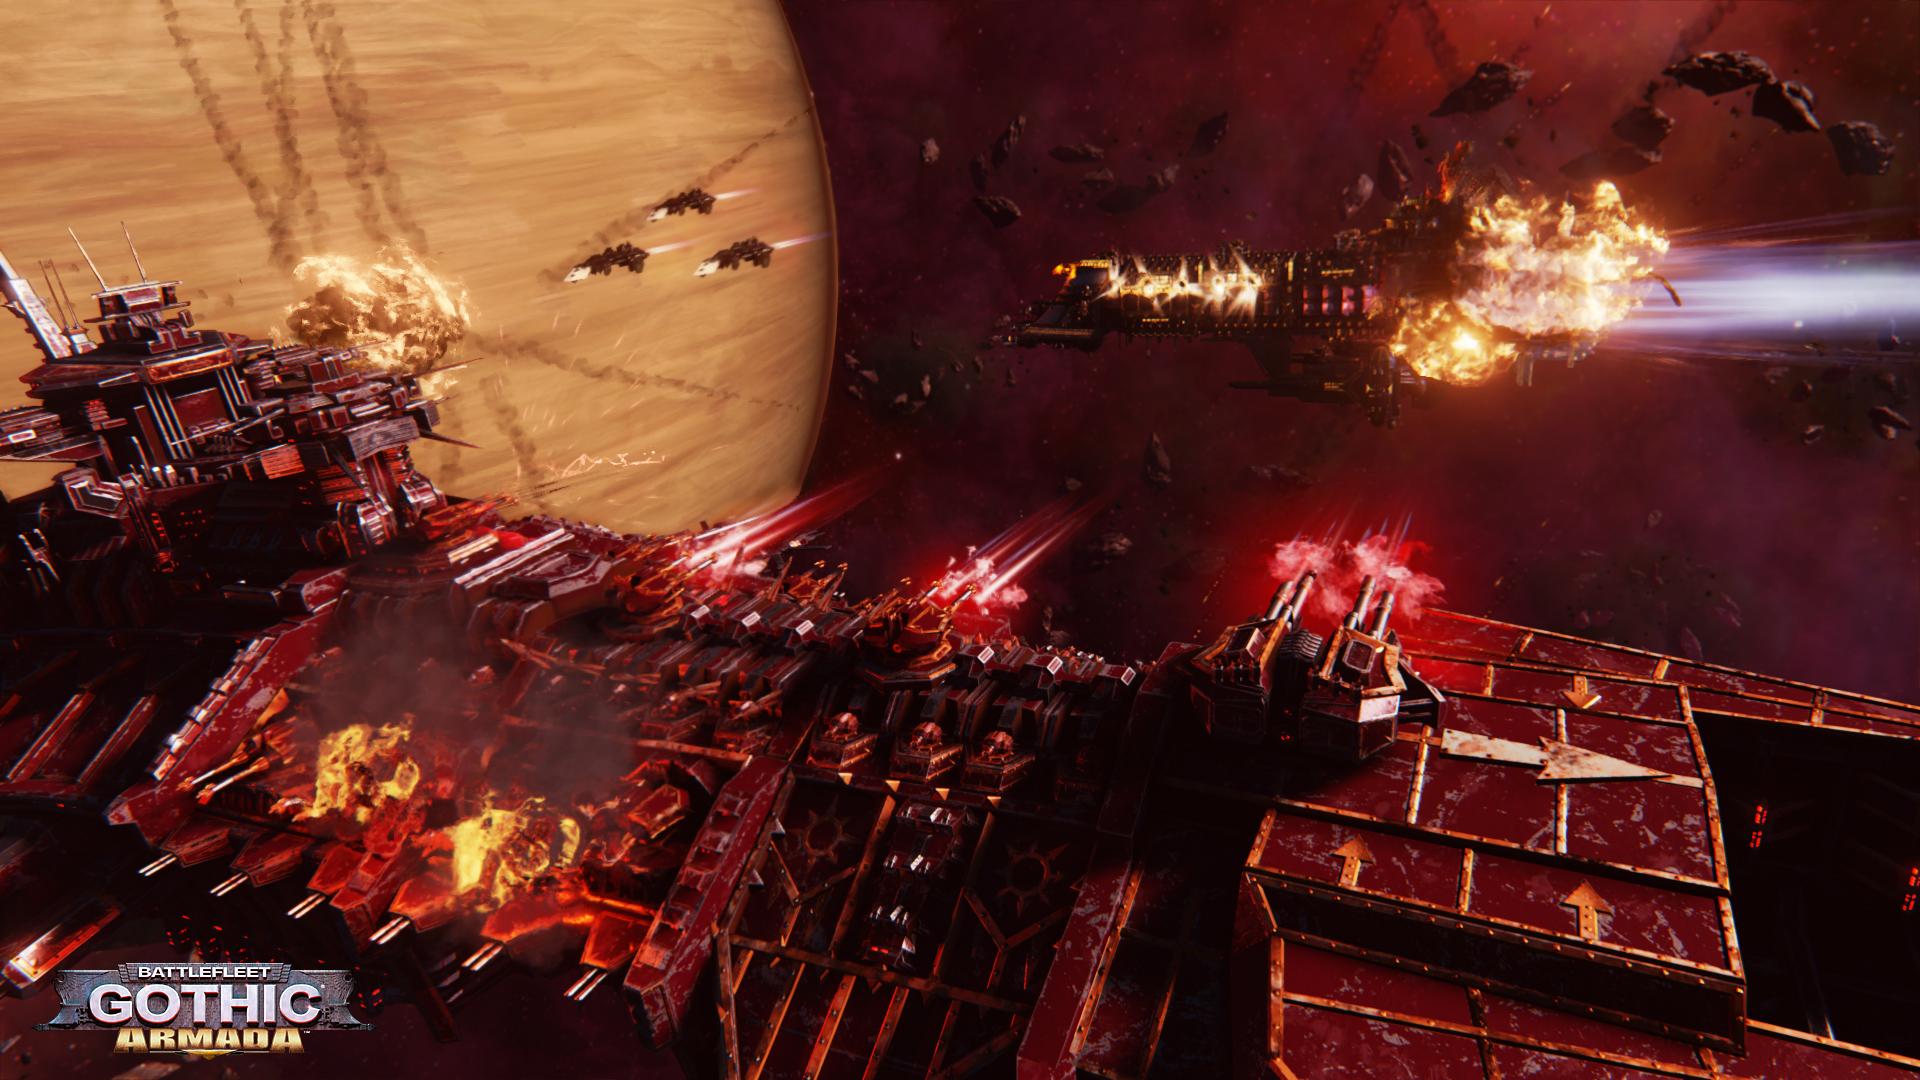 [Jeu vidéo] Battlefleet Gothic : Armada - Page 2 1433846605-6527-capture-d-ecran-pc